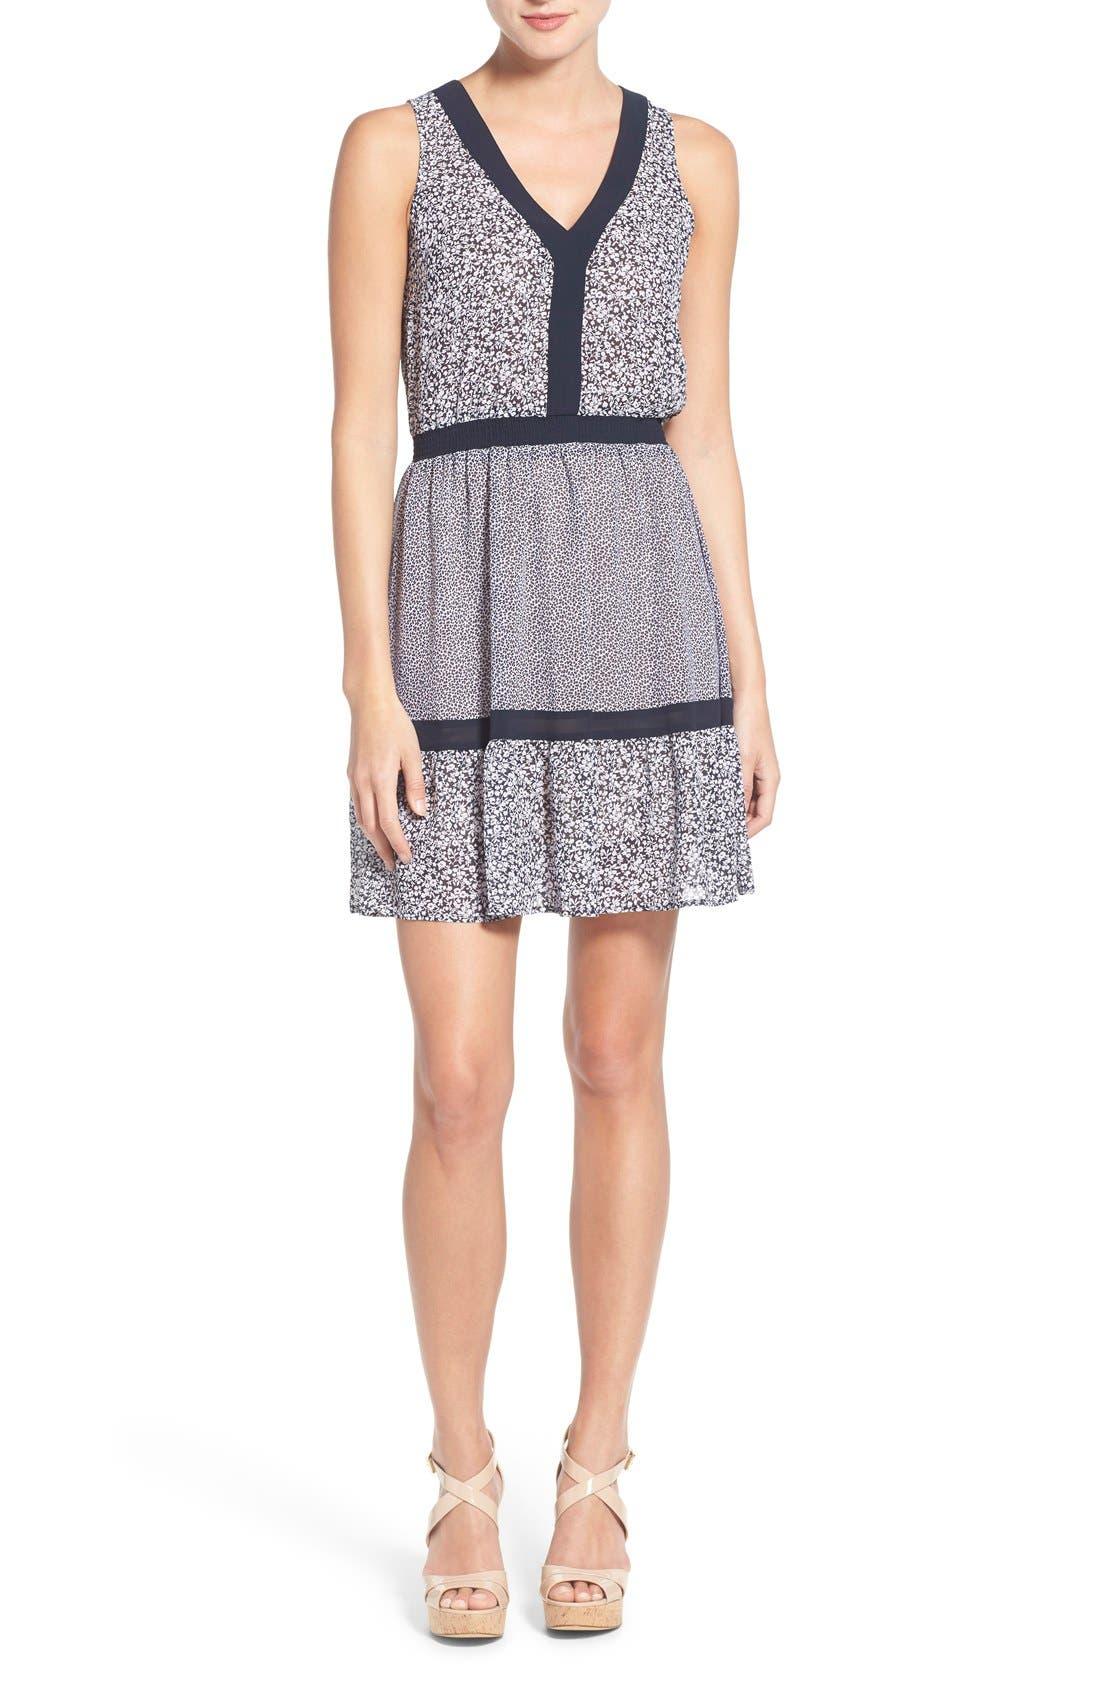 Alternate Image 1 Selected - MICHAEL Michael Kors Mixed Print Sleeveless Georgette Fit & Flare Dress